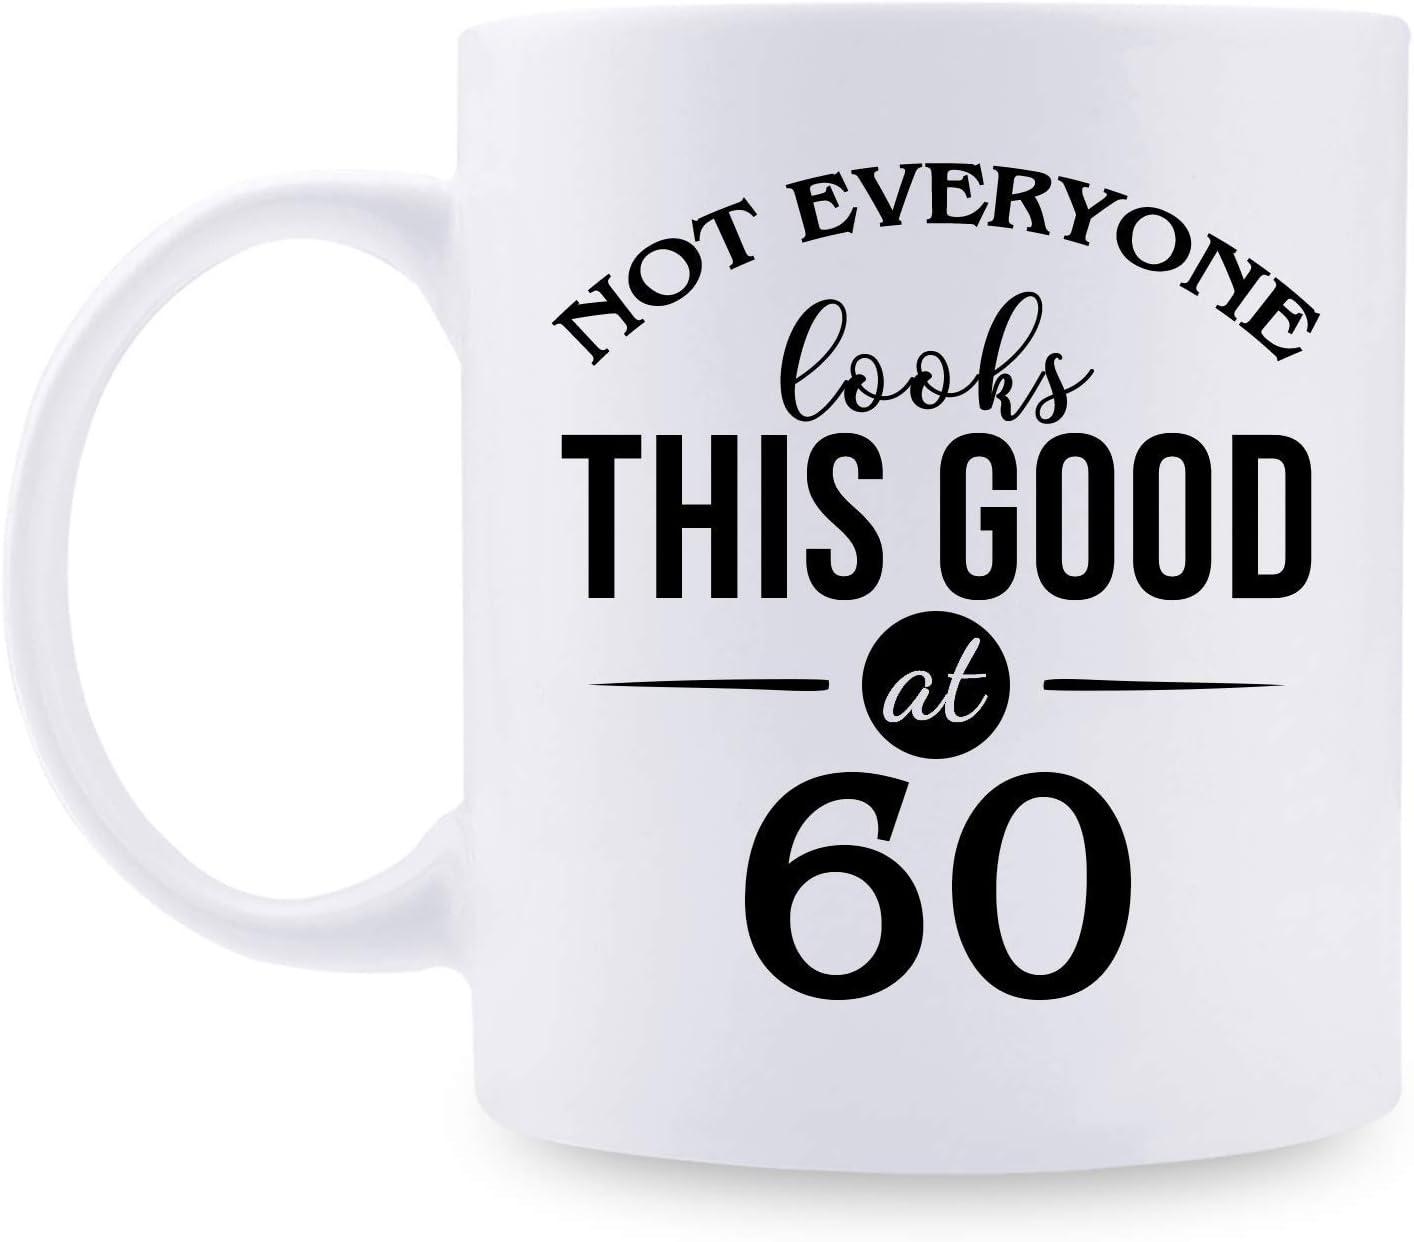 60th Birthday Gifts for Women - 1960 Birthday Gifts for Women, 60 Years Old Birthday Gifts Taza de café para mamá, esposa, amiga, hermana, ella, colega, compañera de trabajo, se ve bien